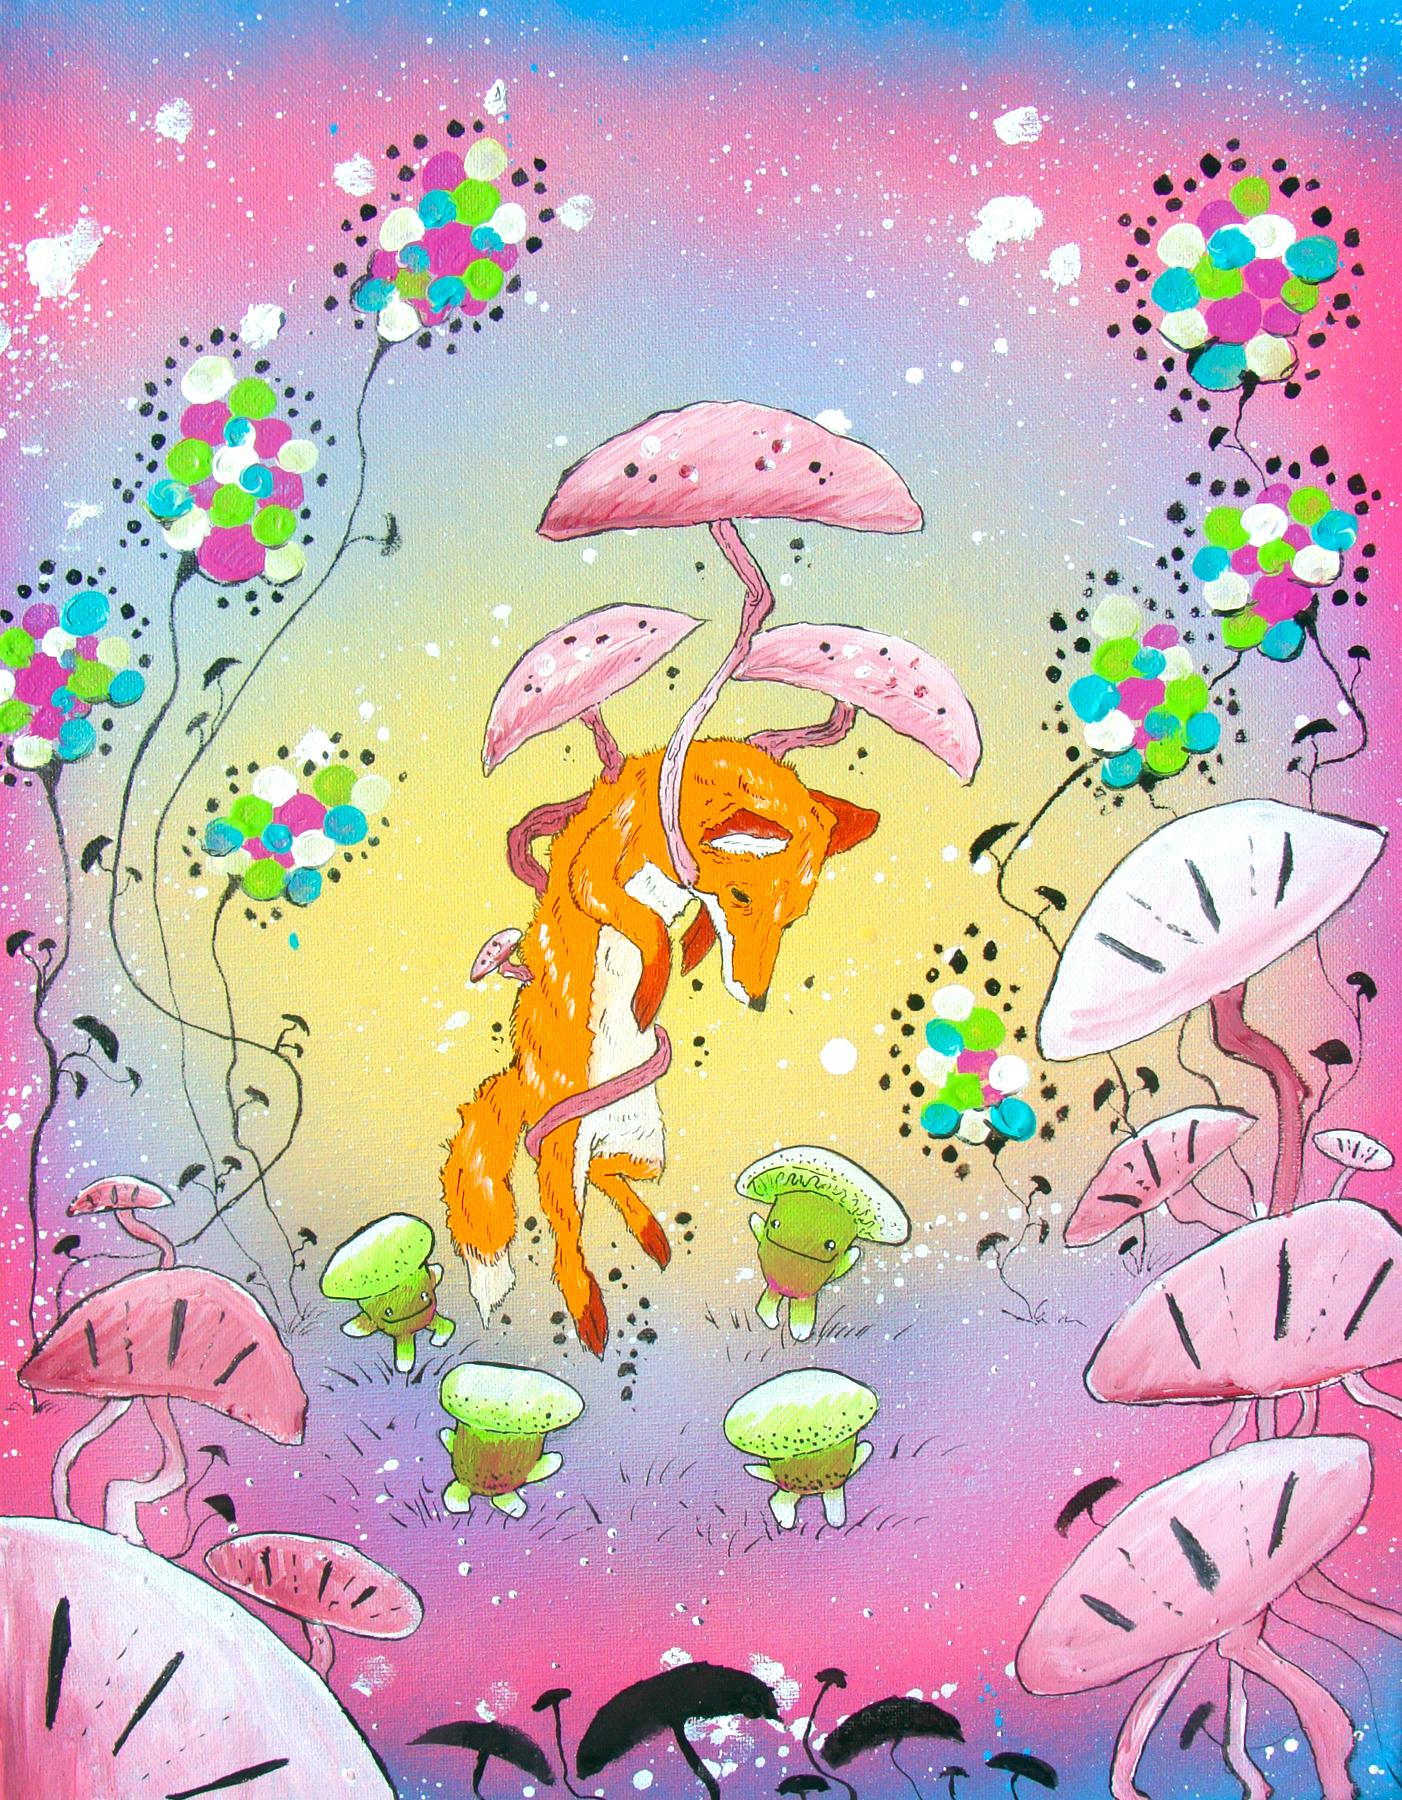 The Fox and the Mushroom People